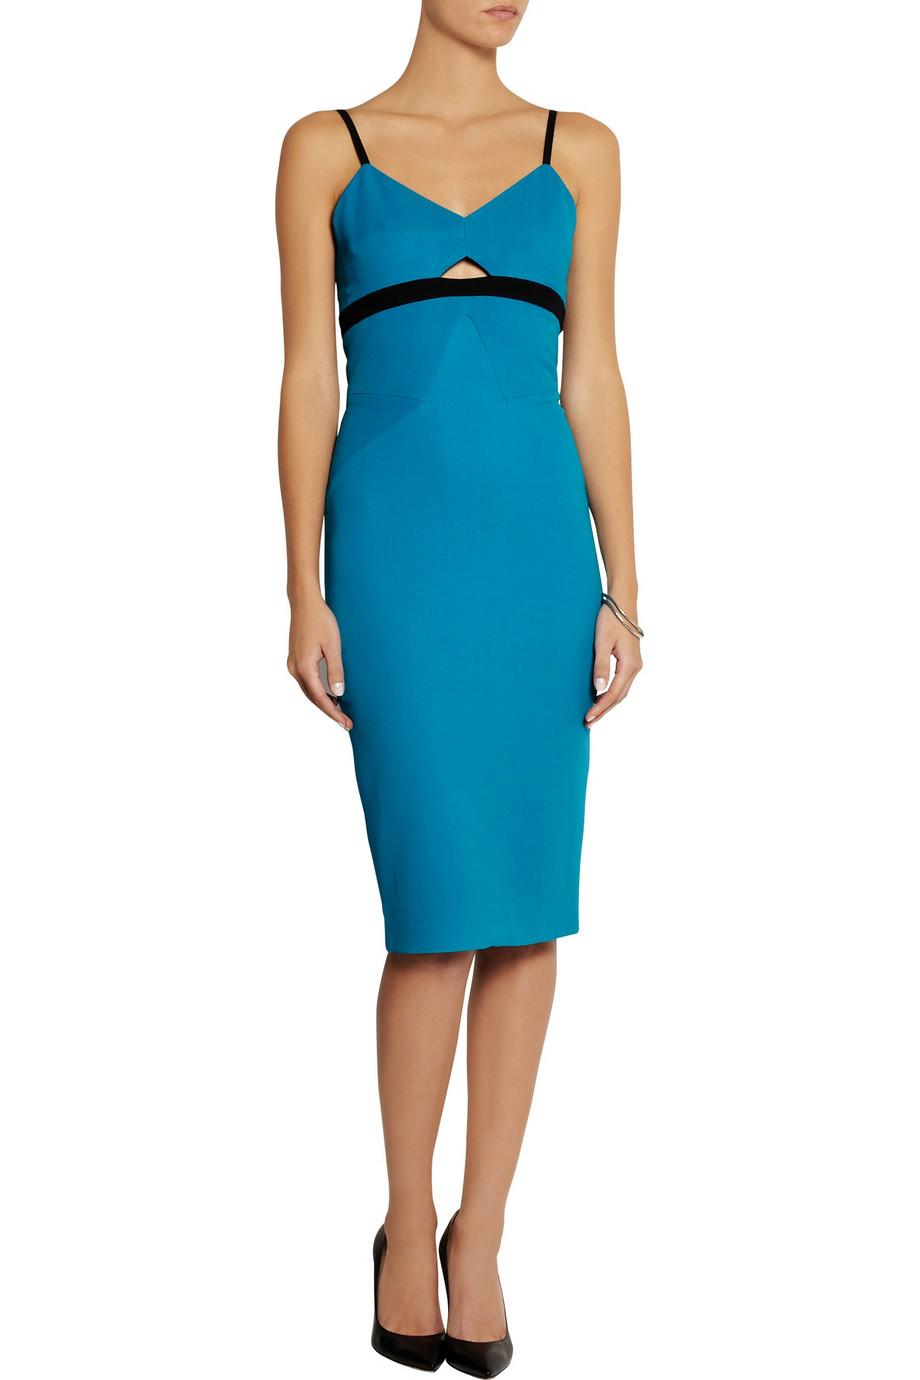 Lyst Victoria Beckham Crepe Dress In Blue